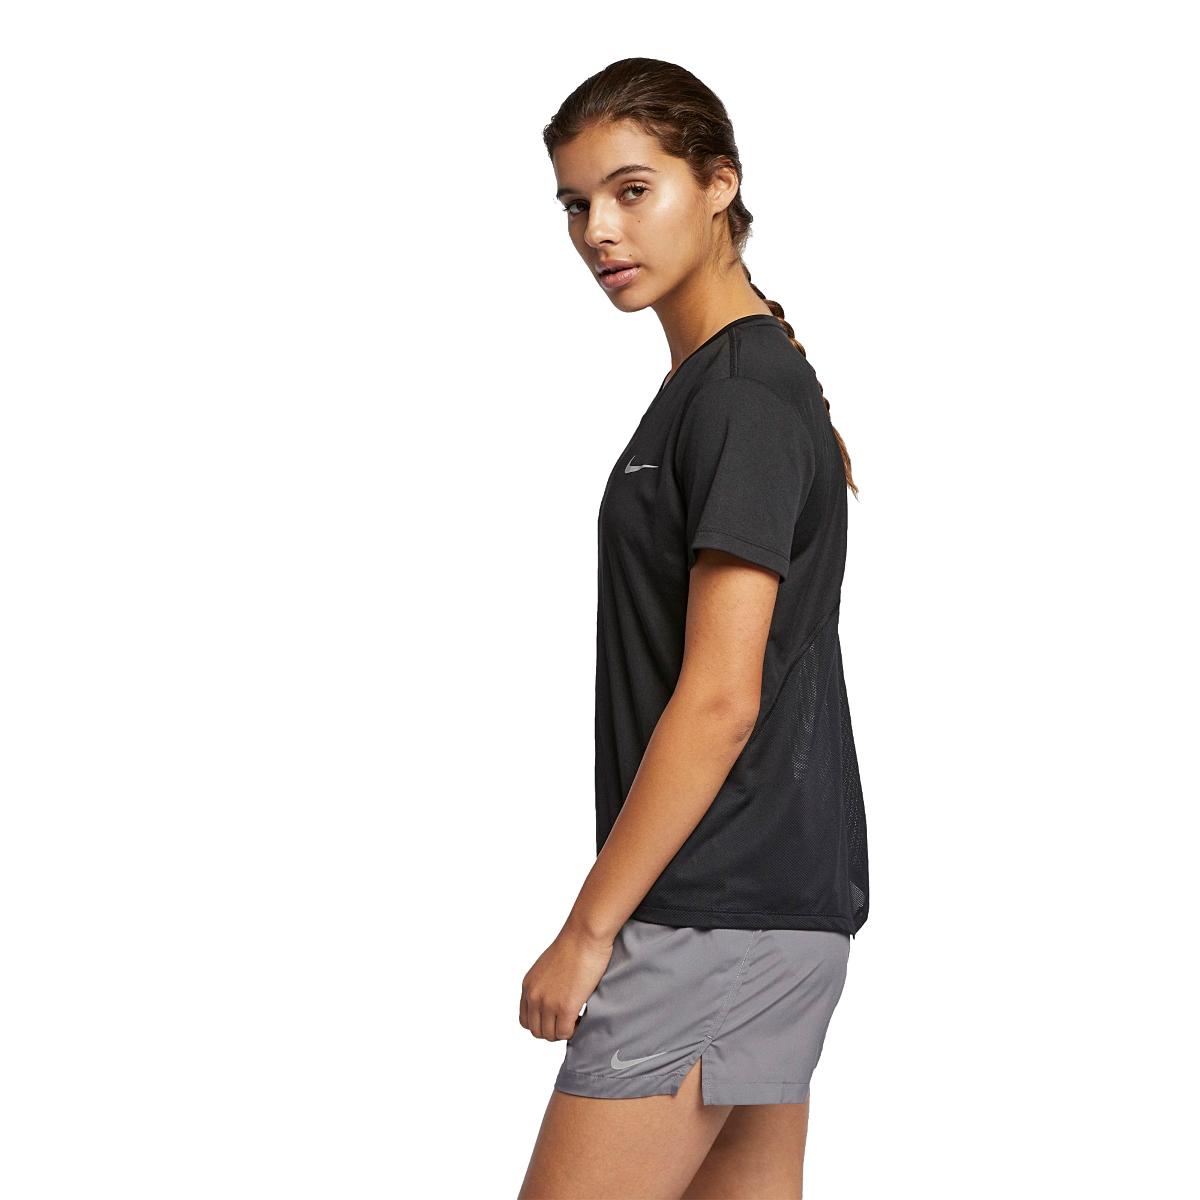 Women's Nike Miler Short Sleeve - Color: Black - Size: XS - Width:, Black, large, image 3